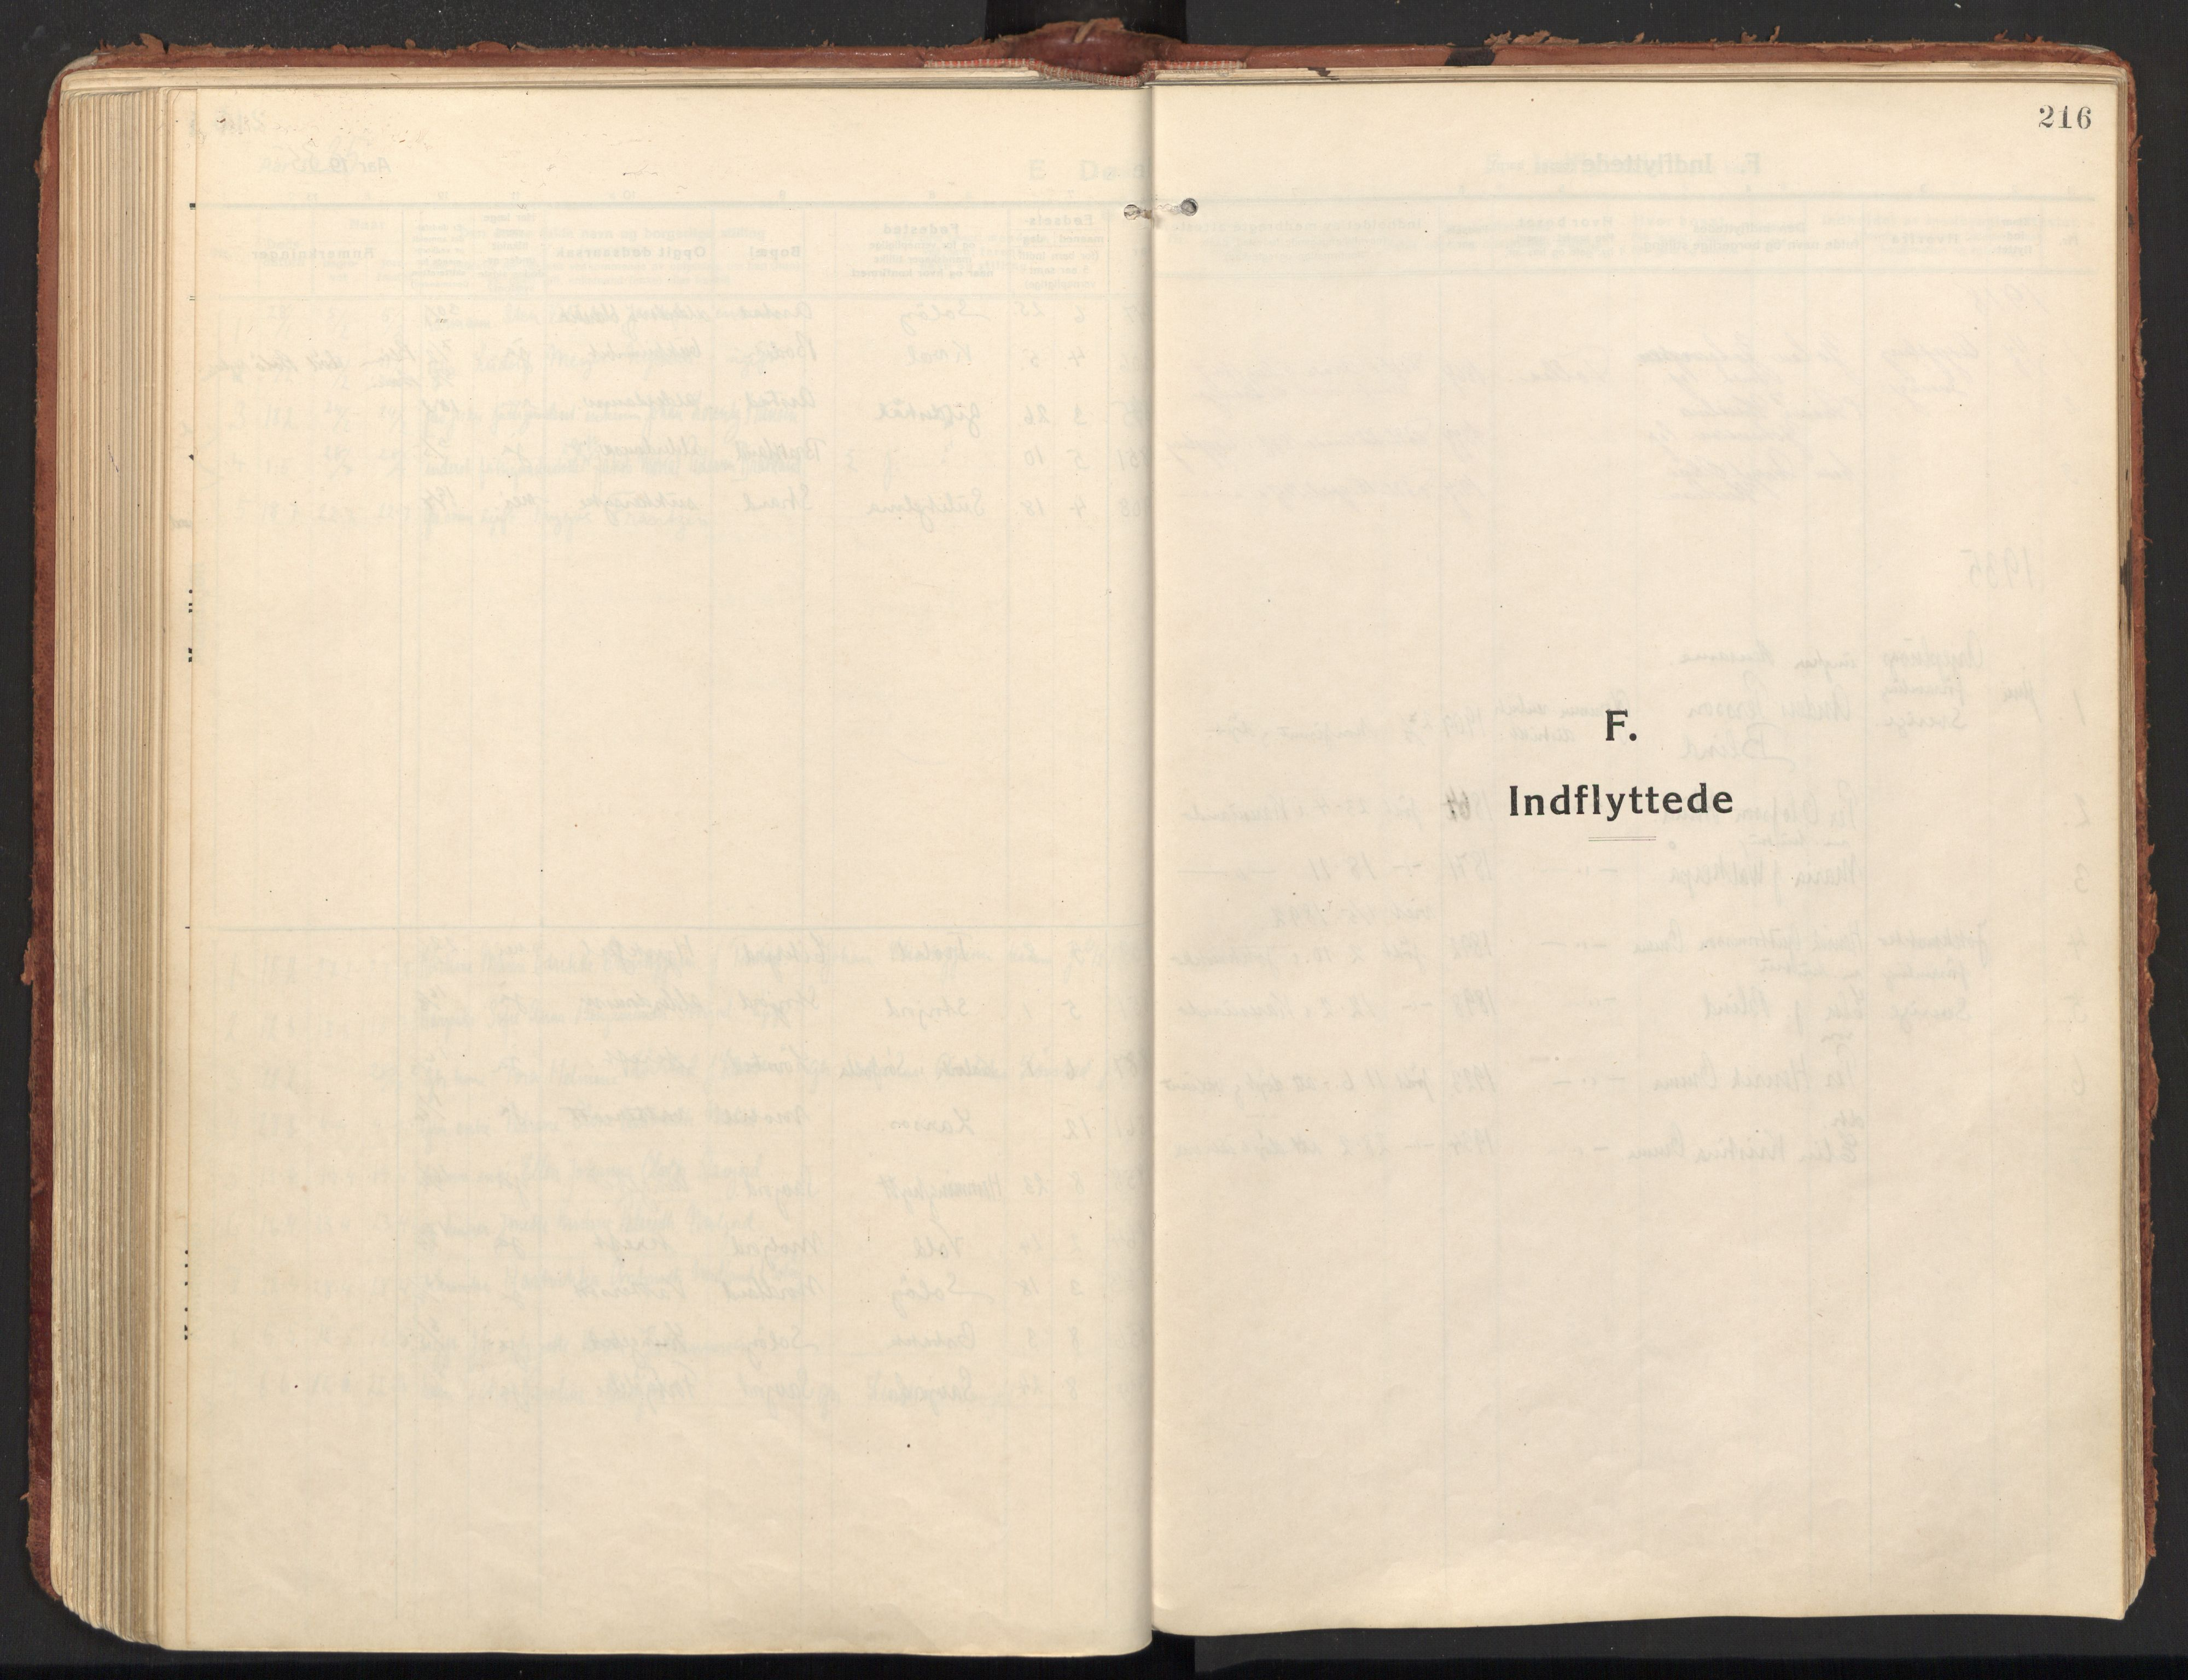 SAT, Ministerialprotokoller, klokkerbøker og fødselsregistre - Nordland, 846/L0650: Ministerialbok nr. 846A08, 1916-1935, s. 216